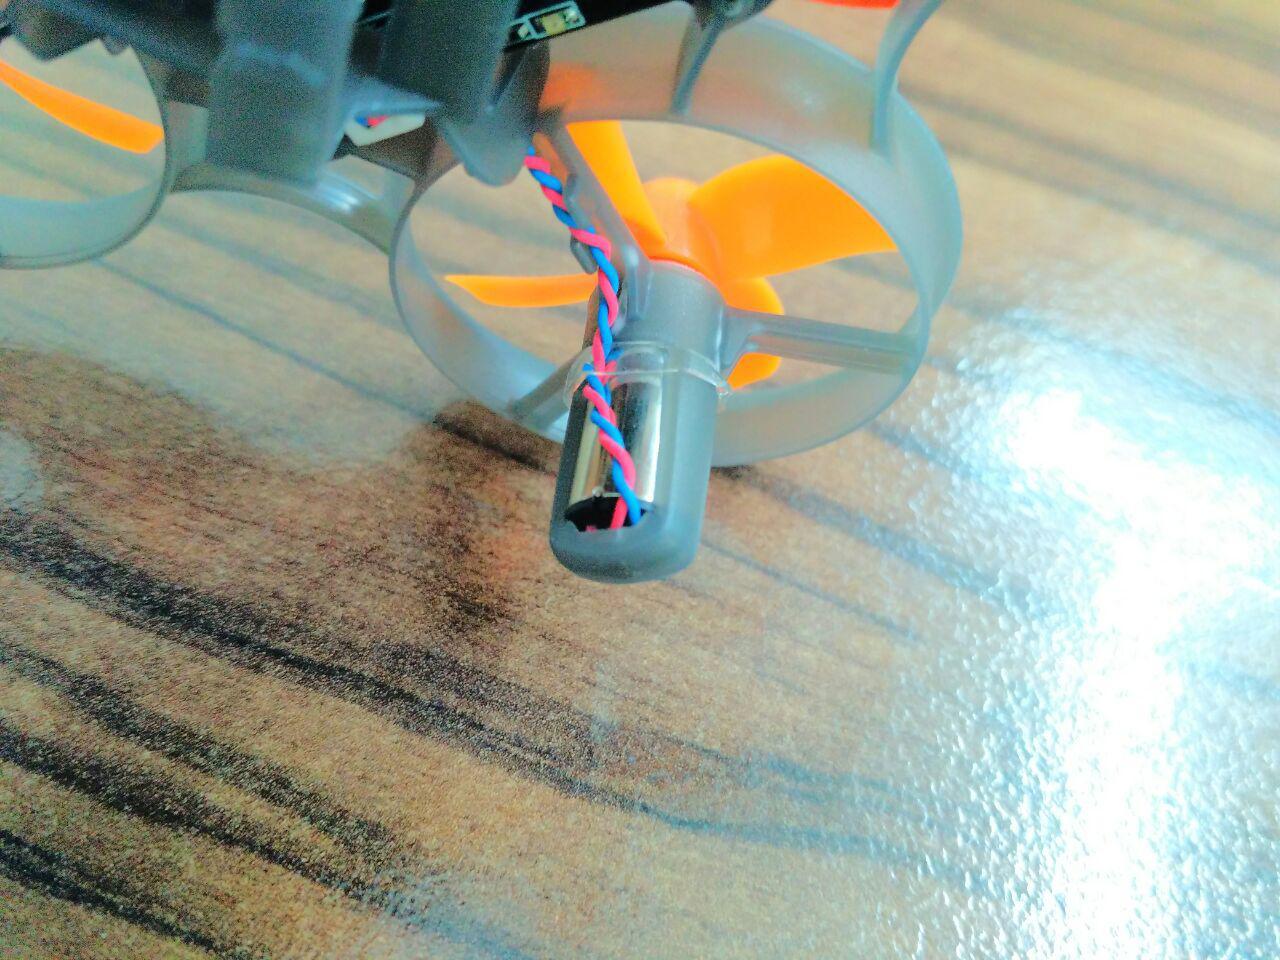 Makerfire Armor 65 Lite лучший микро дрон за 3200 р. или 50$